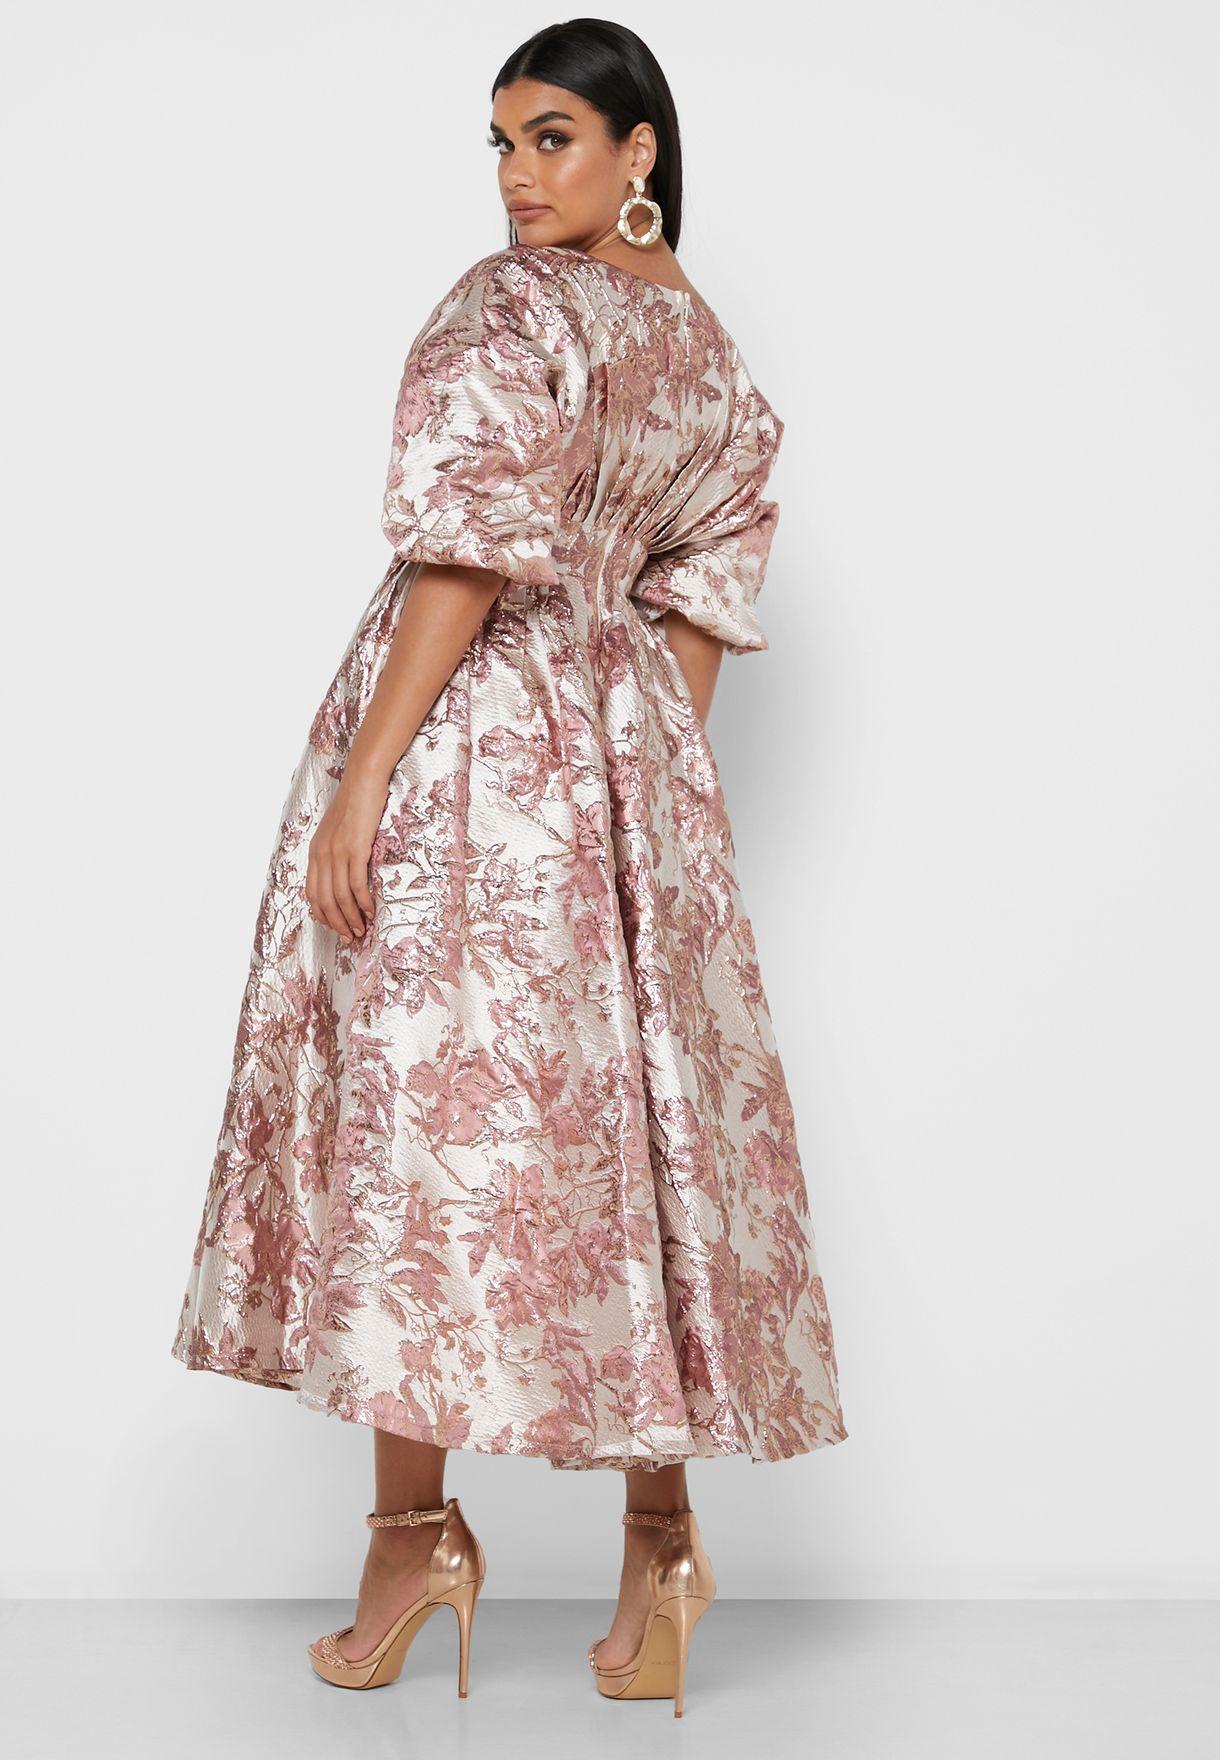 فستان ميدي مزين بأزهار